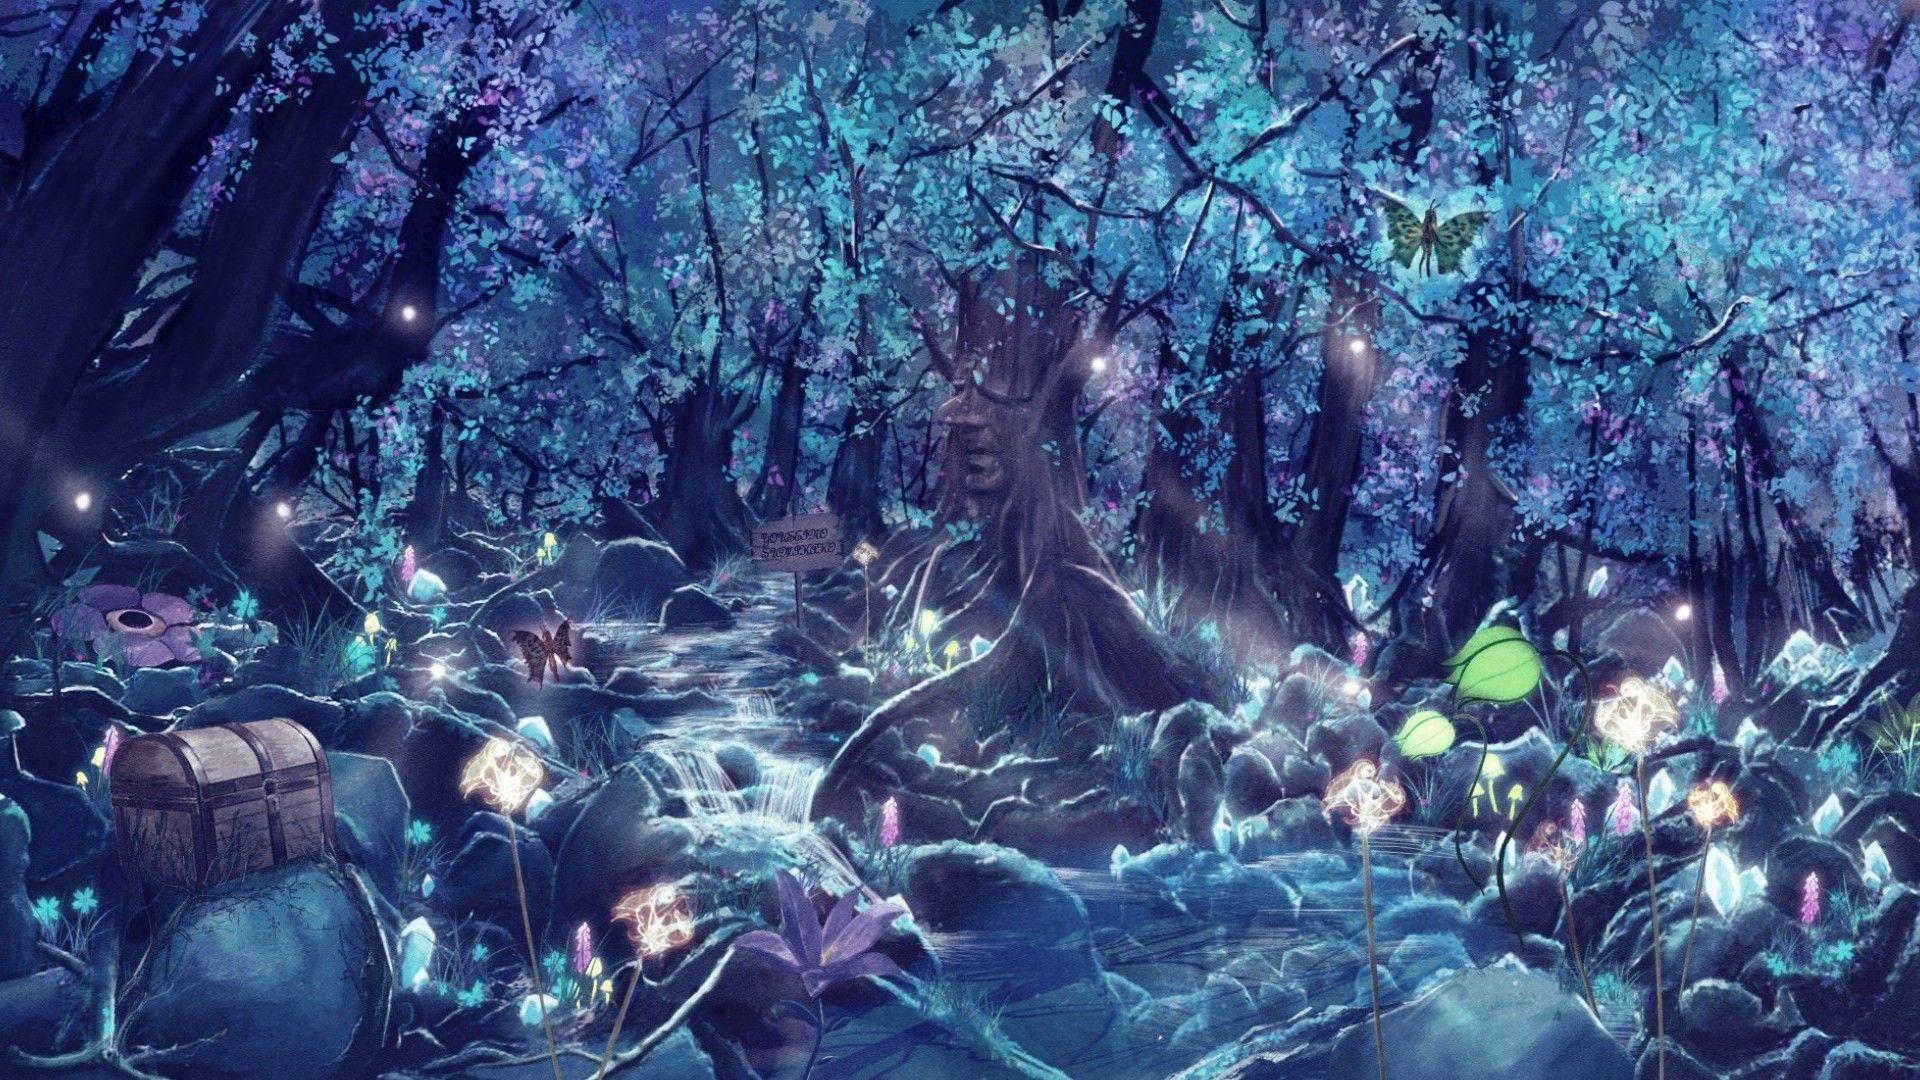 Fantasy Forest Blue Steam Flower Butterfly Wallpaper